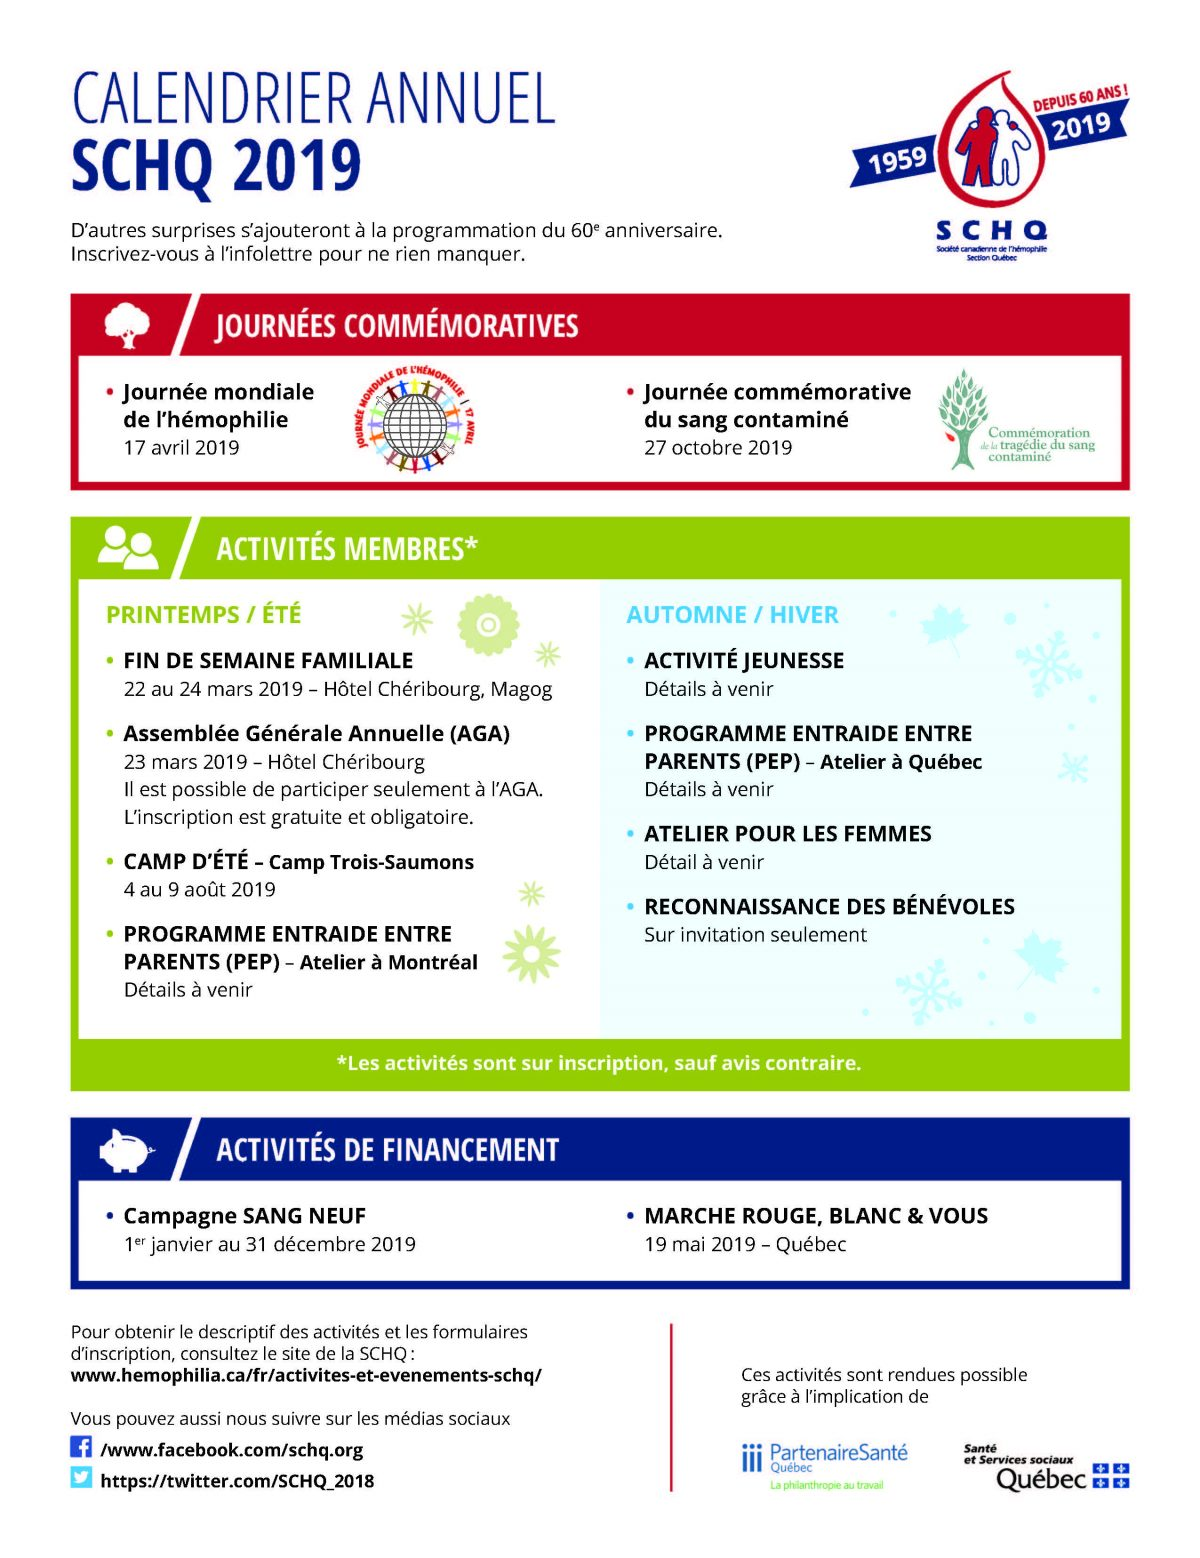 Activities and Events - CHSQ   Hemophilia